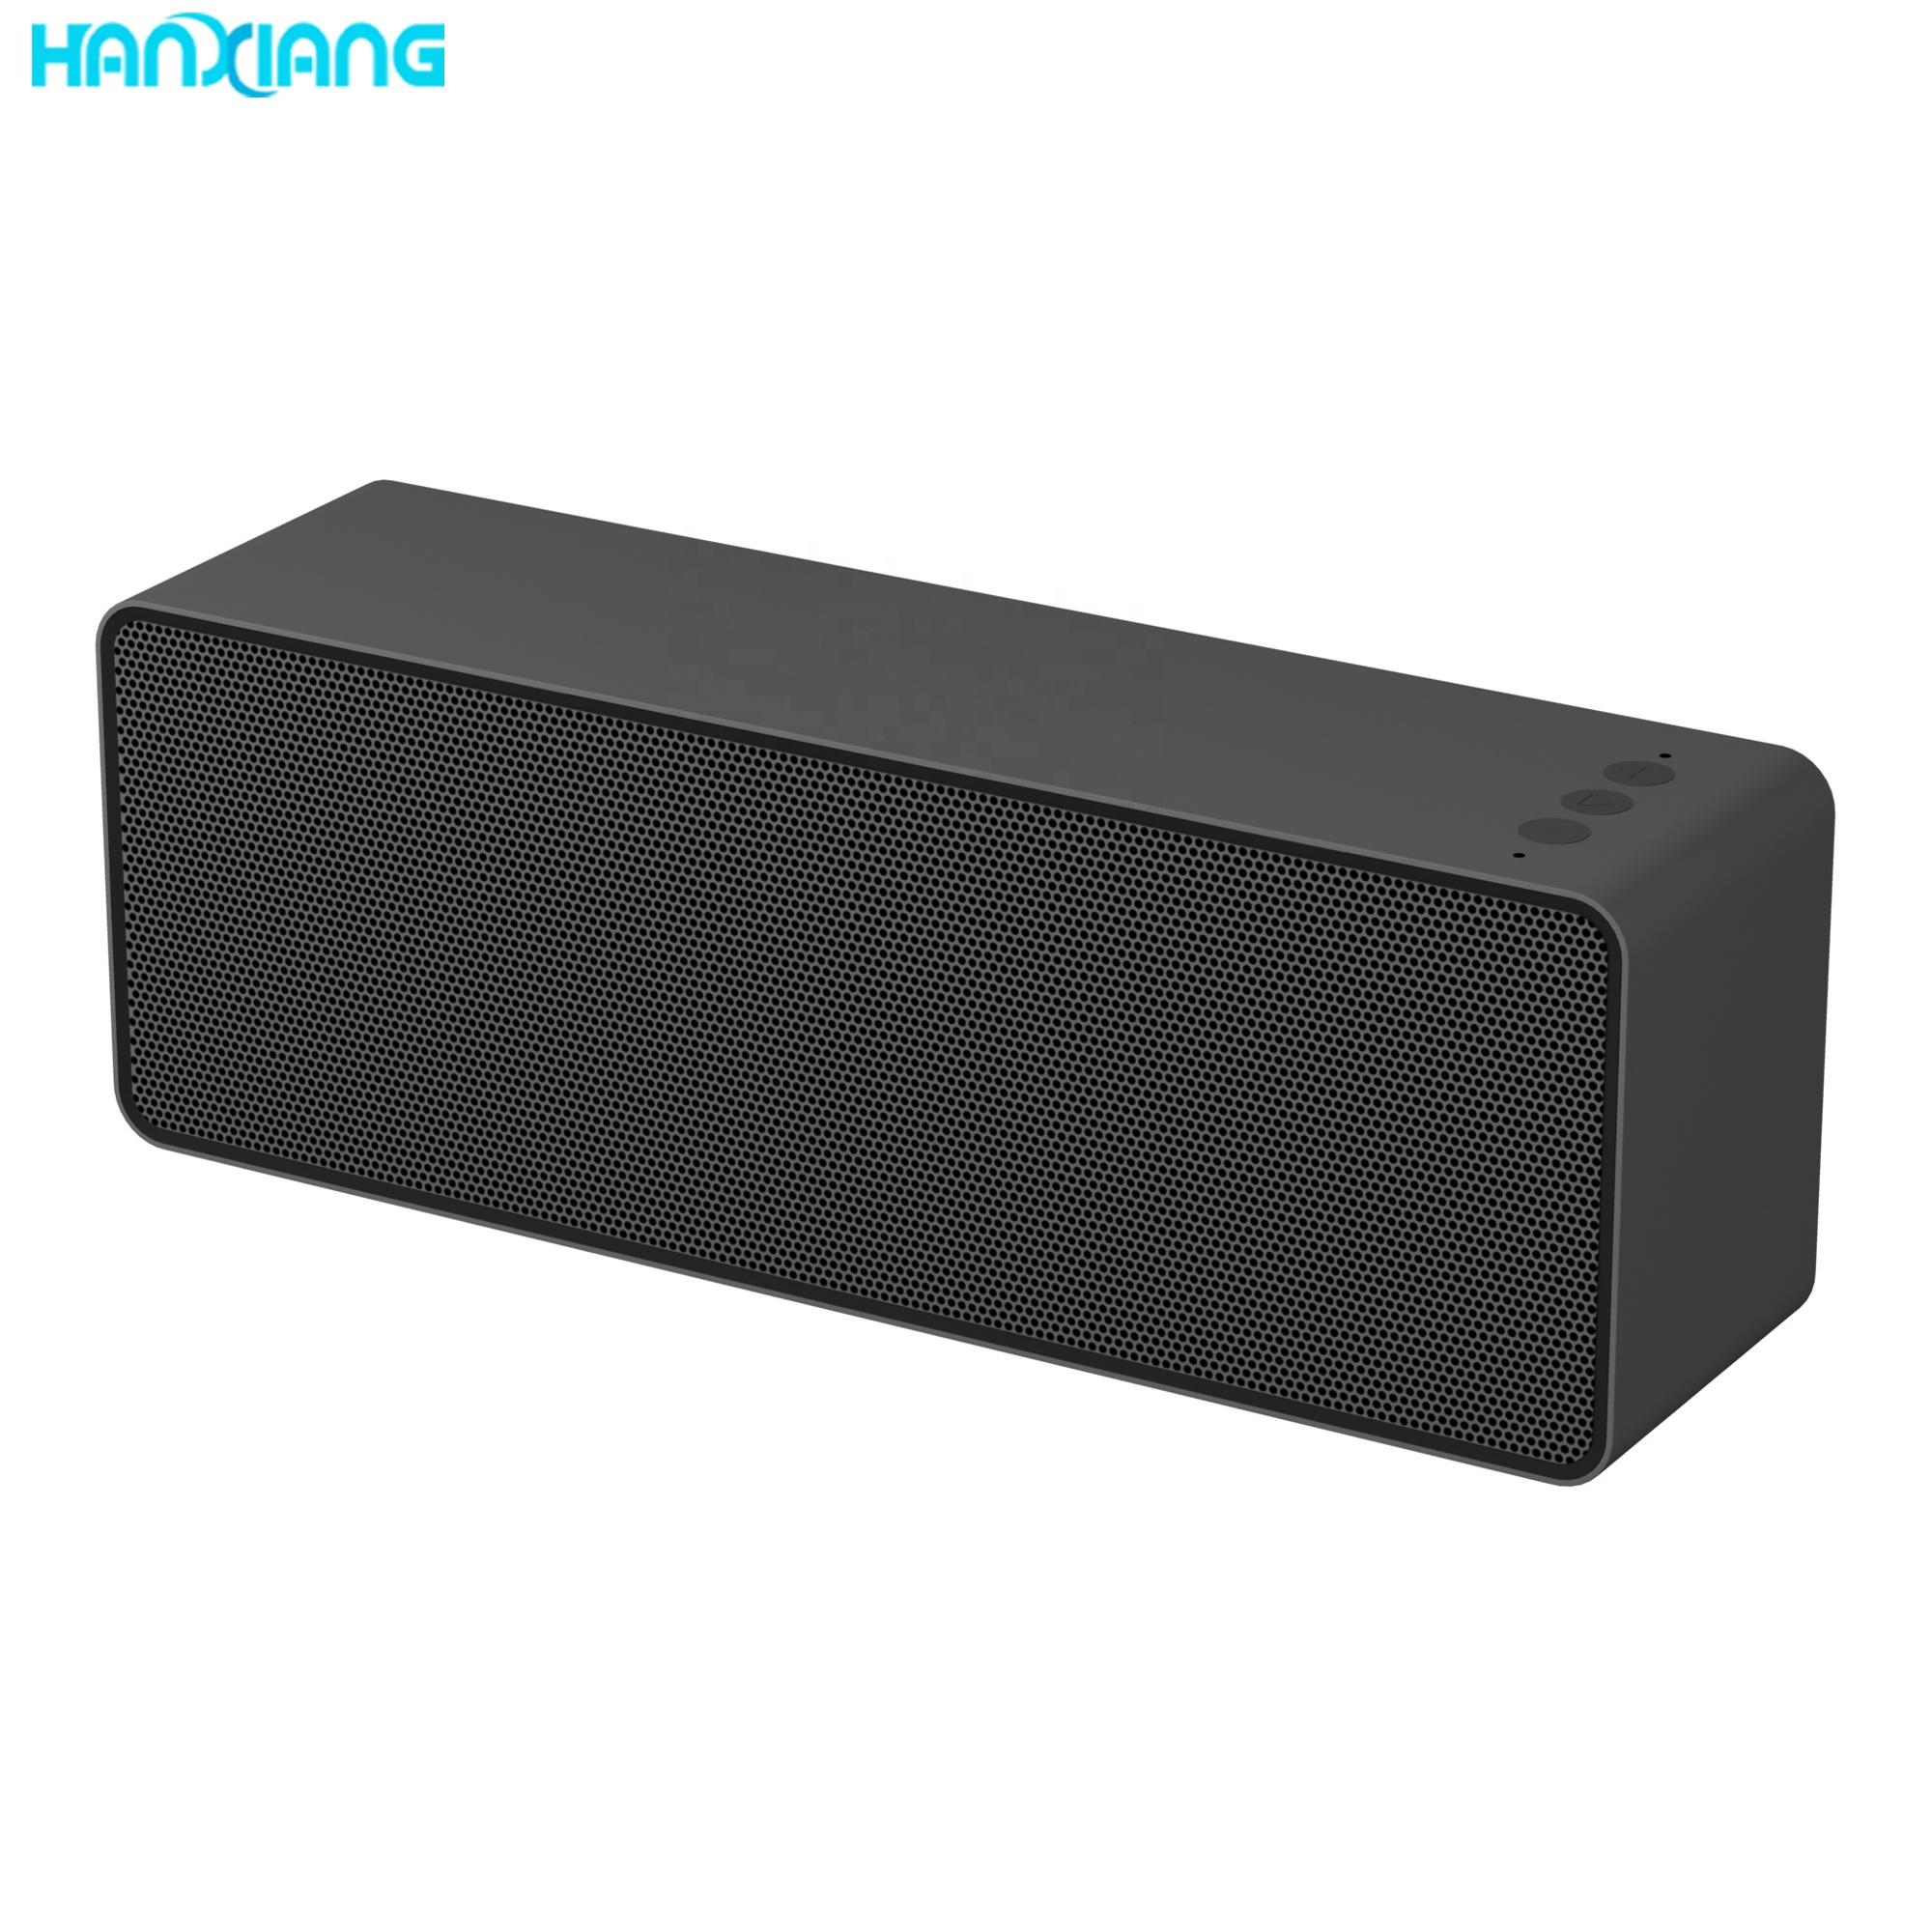 2020 New Design Cell phone Accessories Mini Wireless Outdoor Music BT Speaker For Phone, Music BT Speaker